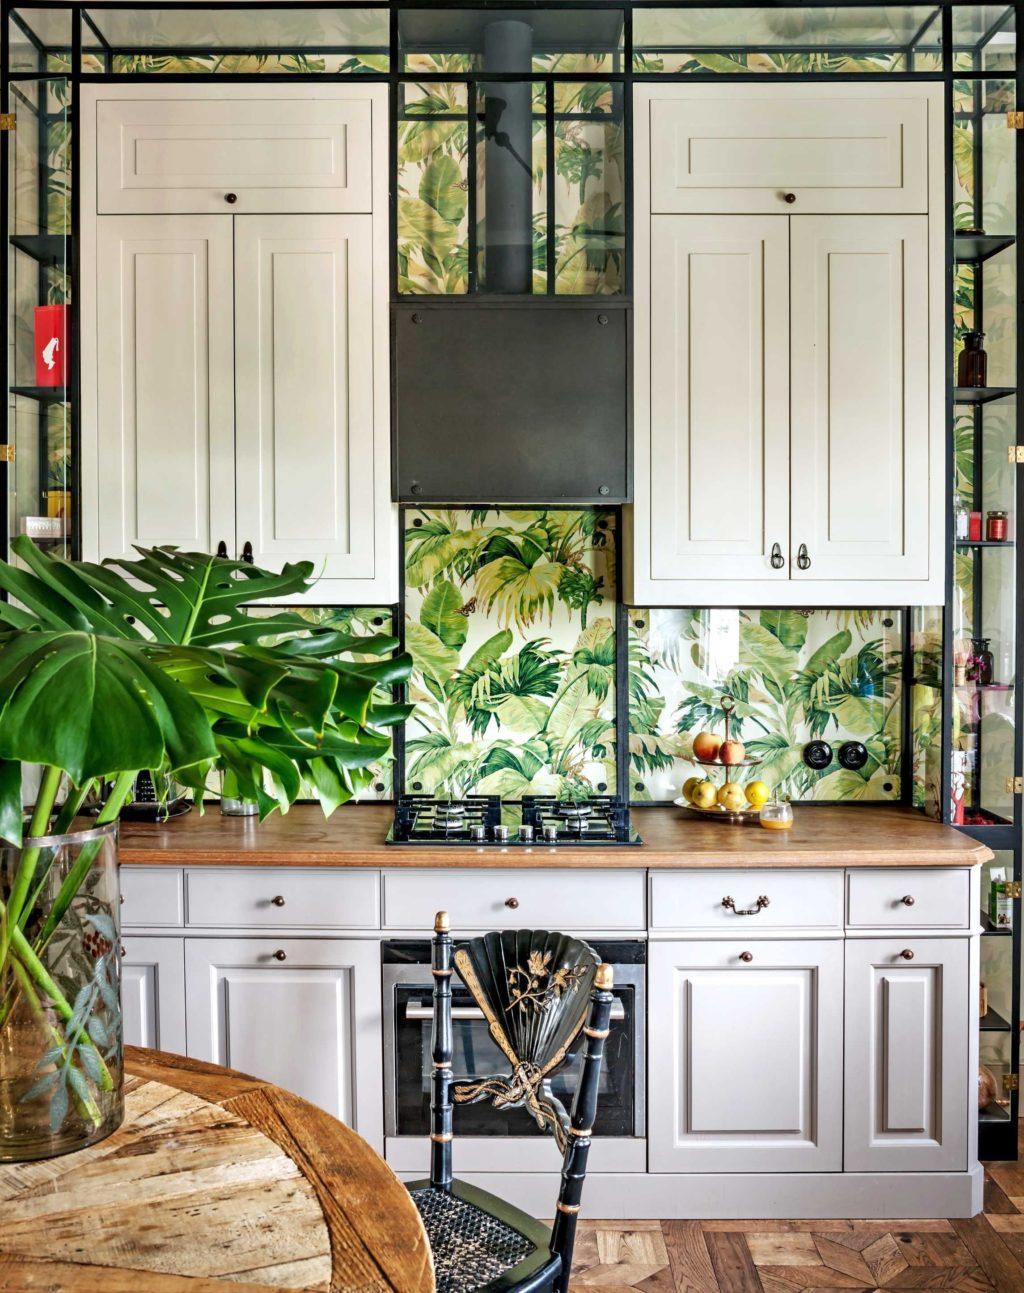 scenery-wallpaper-1024x1293 80+ Unusual Kitchen Design Ideas for Small Spaces in 2021